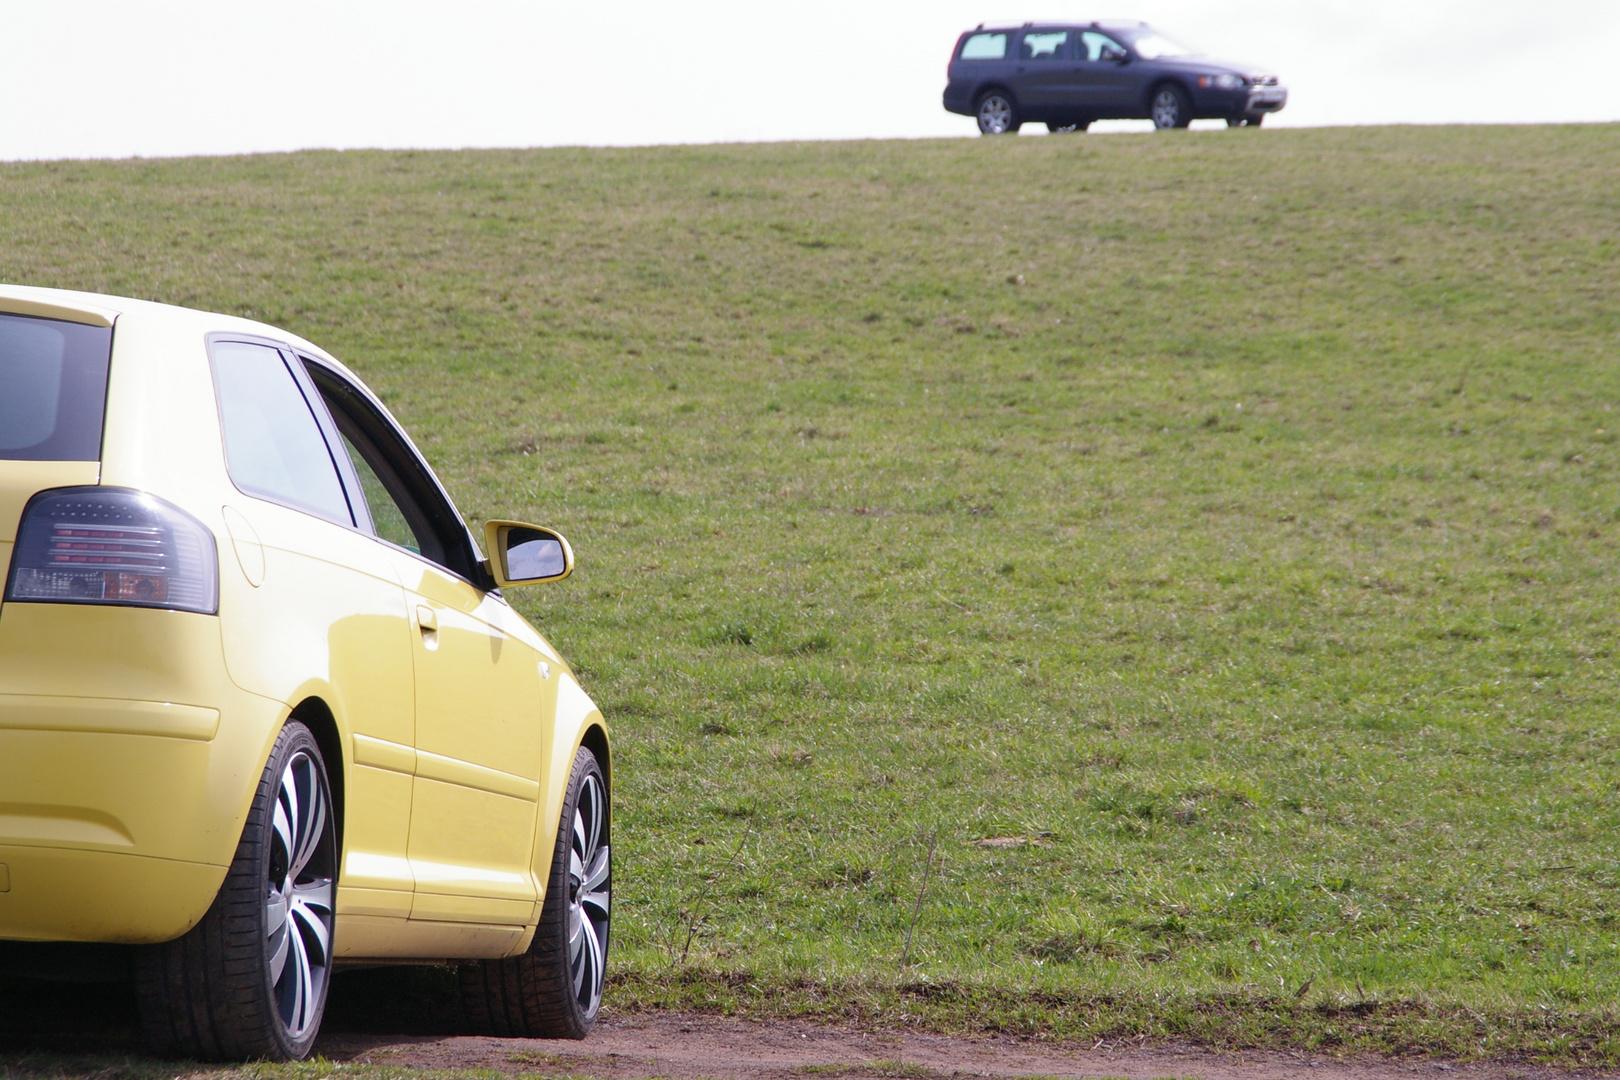 Audi + Volvo Xc70 am horizont